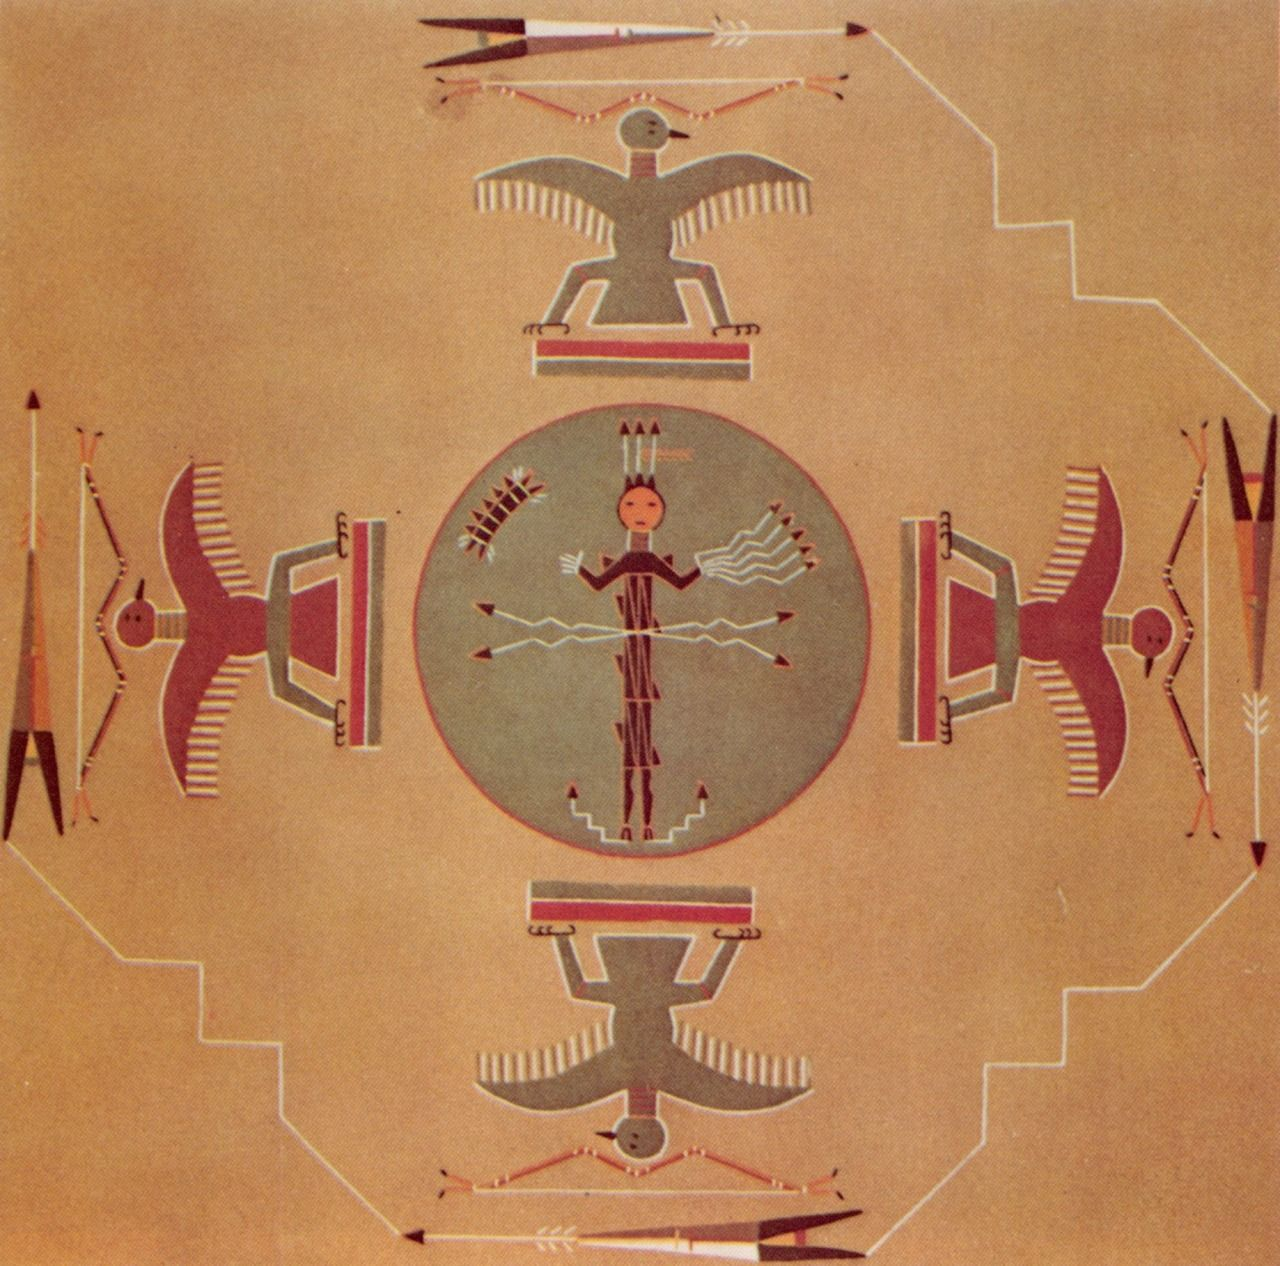 Navajo sand paintings tumblrlv1wl8kzoa1qi8z68o11280g navajo navajo sand paintings tumblrlv1wl8kzoa1qi8z68o11280g biocorpaavc Images